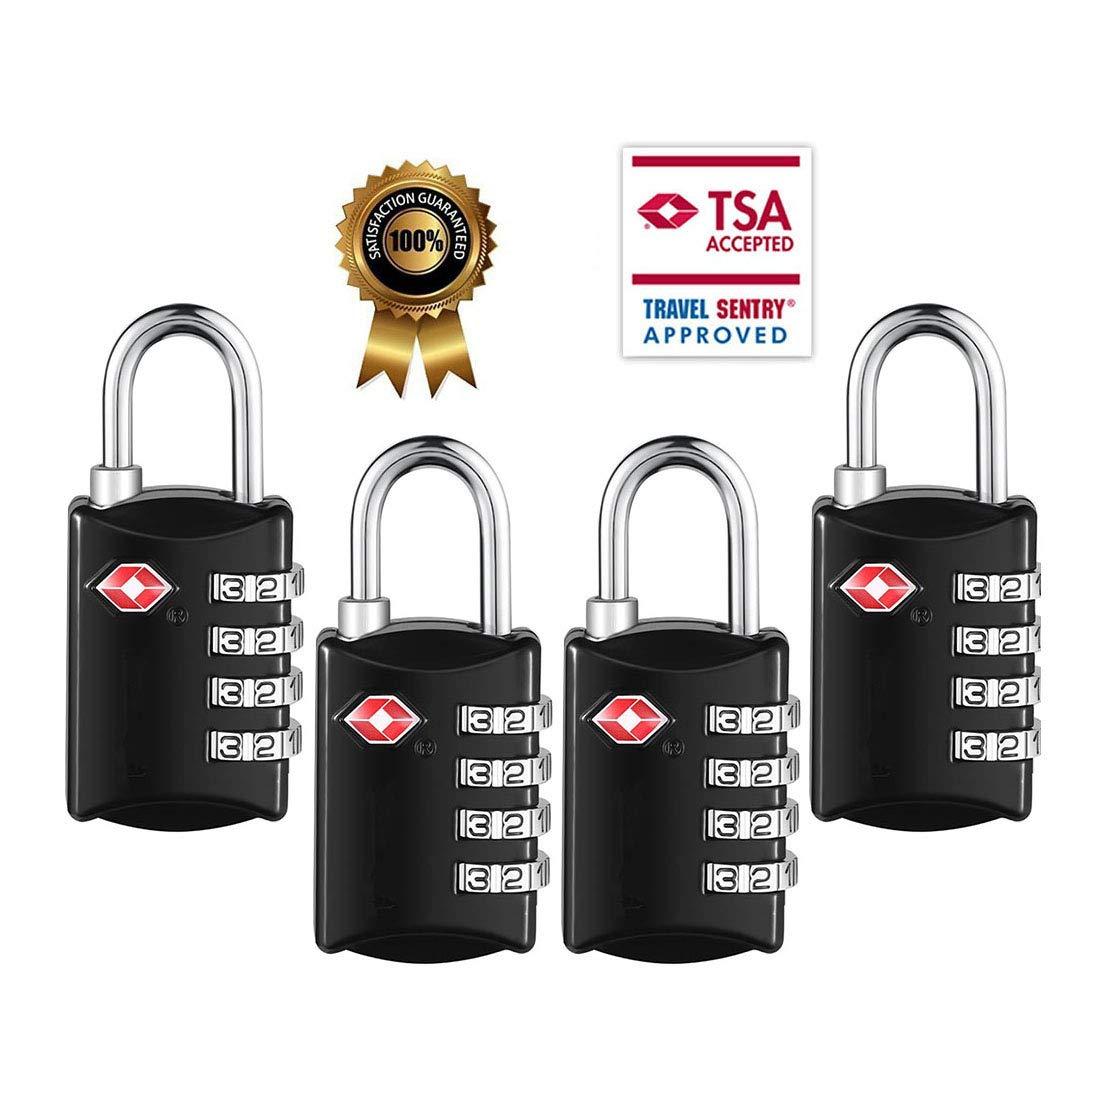 TSA Luggage Locks,TSA Approved Travel Combination Luggage Locks for Suitcases-4 Pack (Black4)